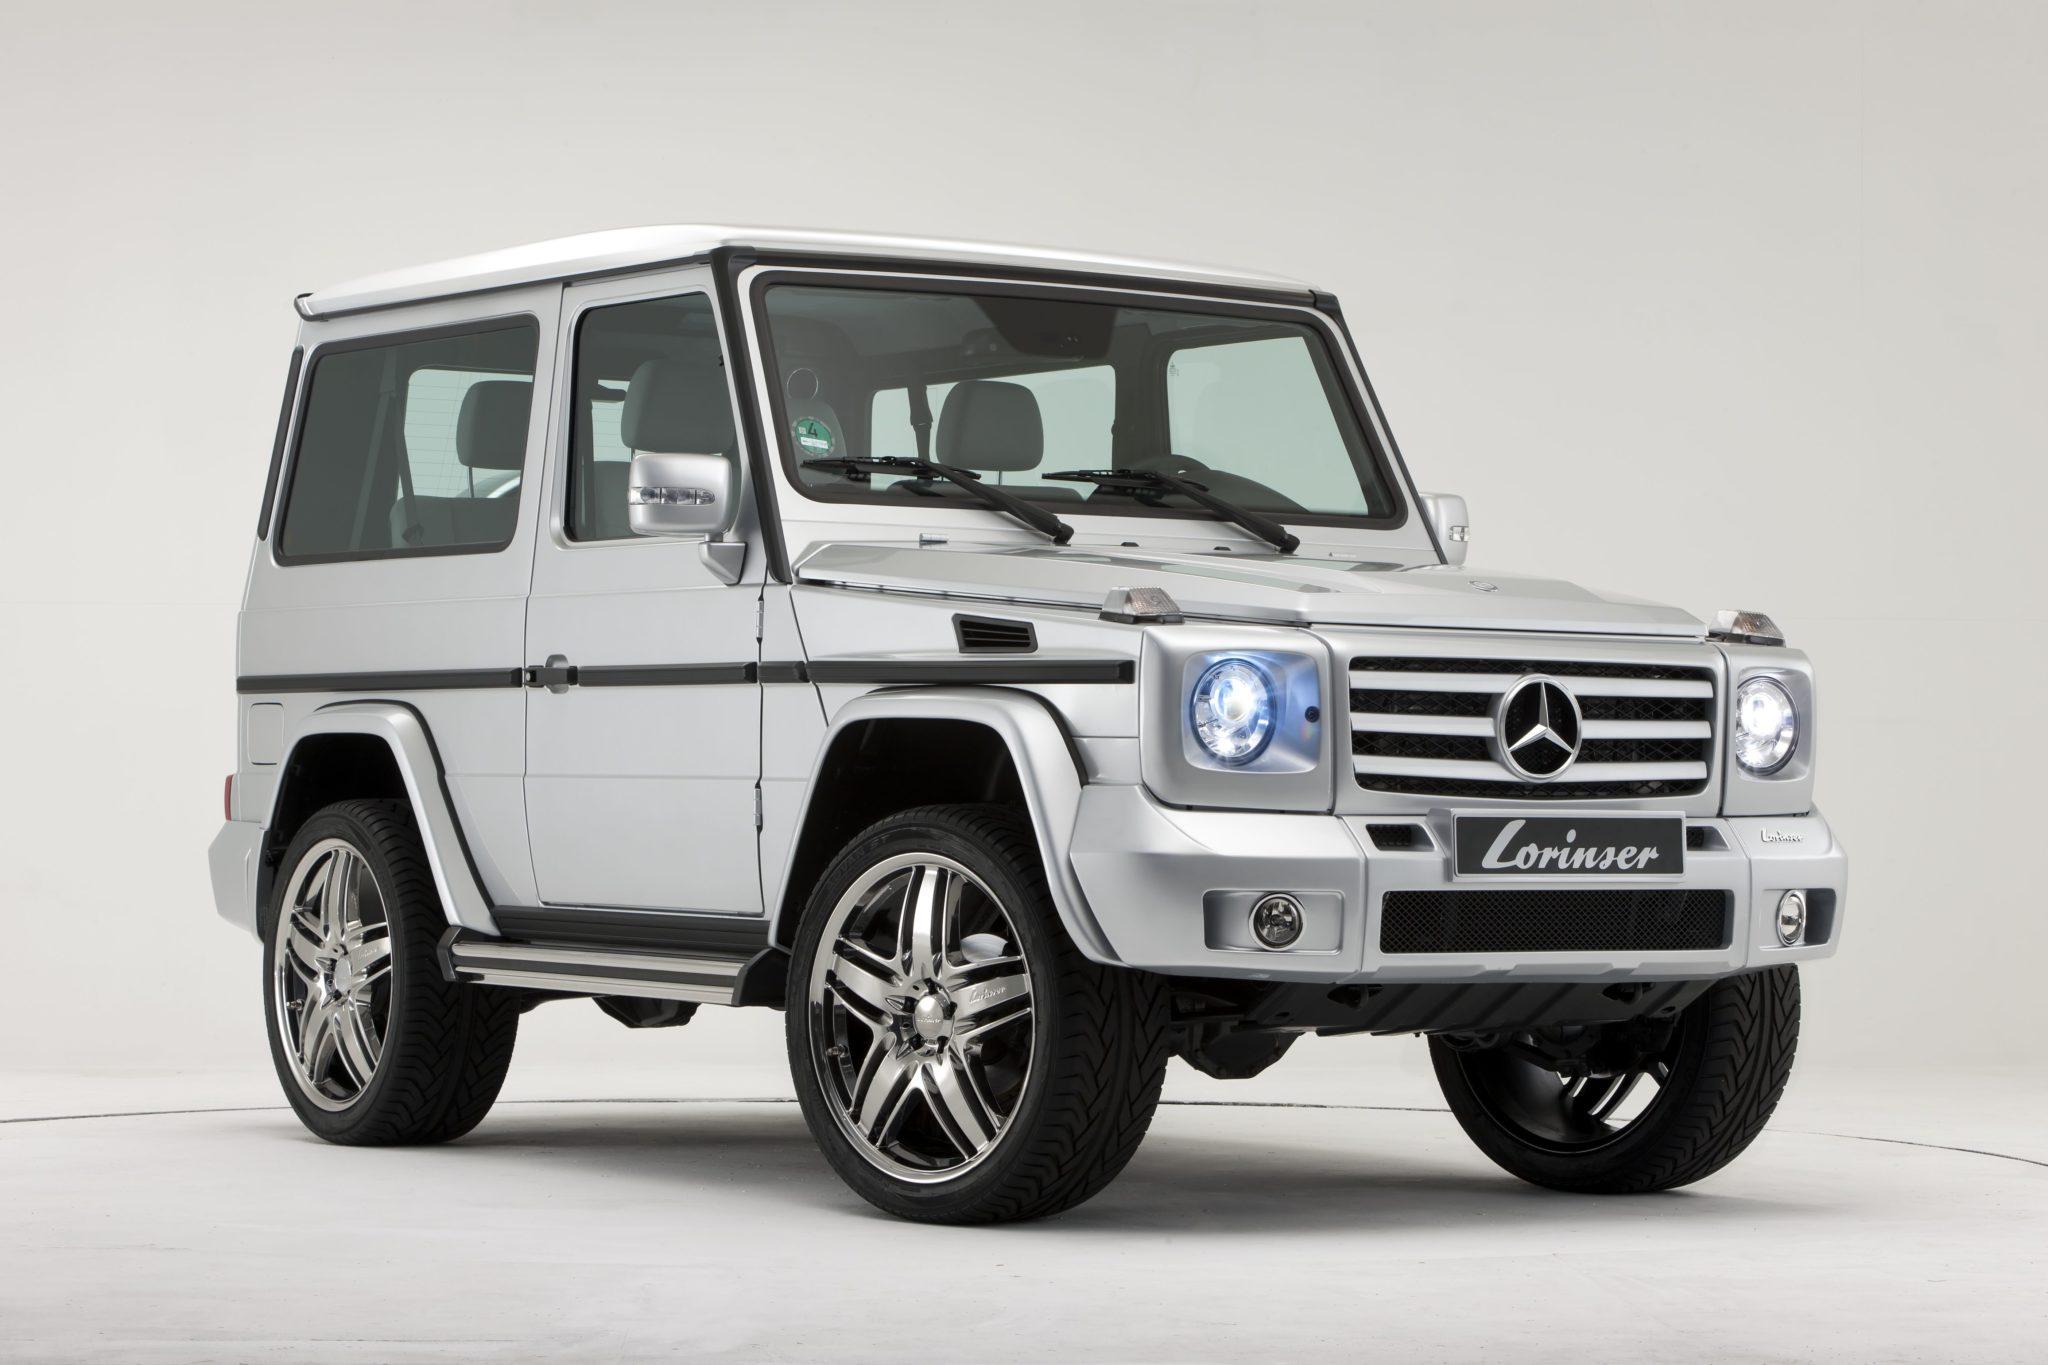 Lorinser g class w463 front bumper for parktronic for Mercedes benz g class parts